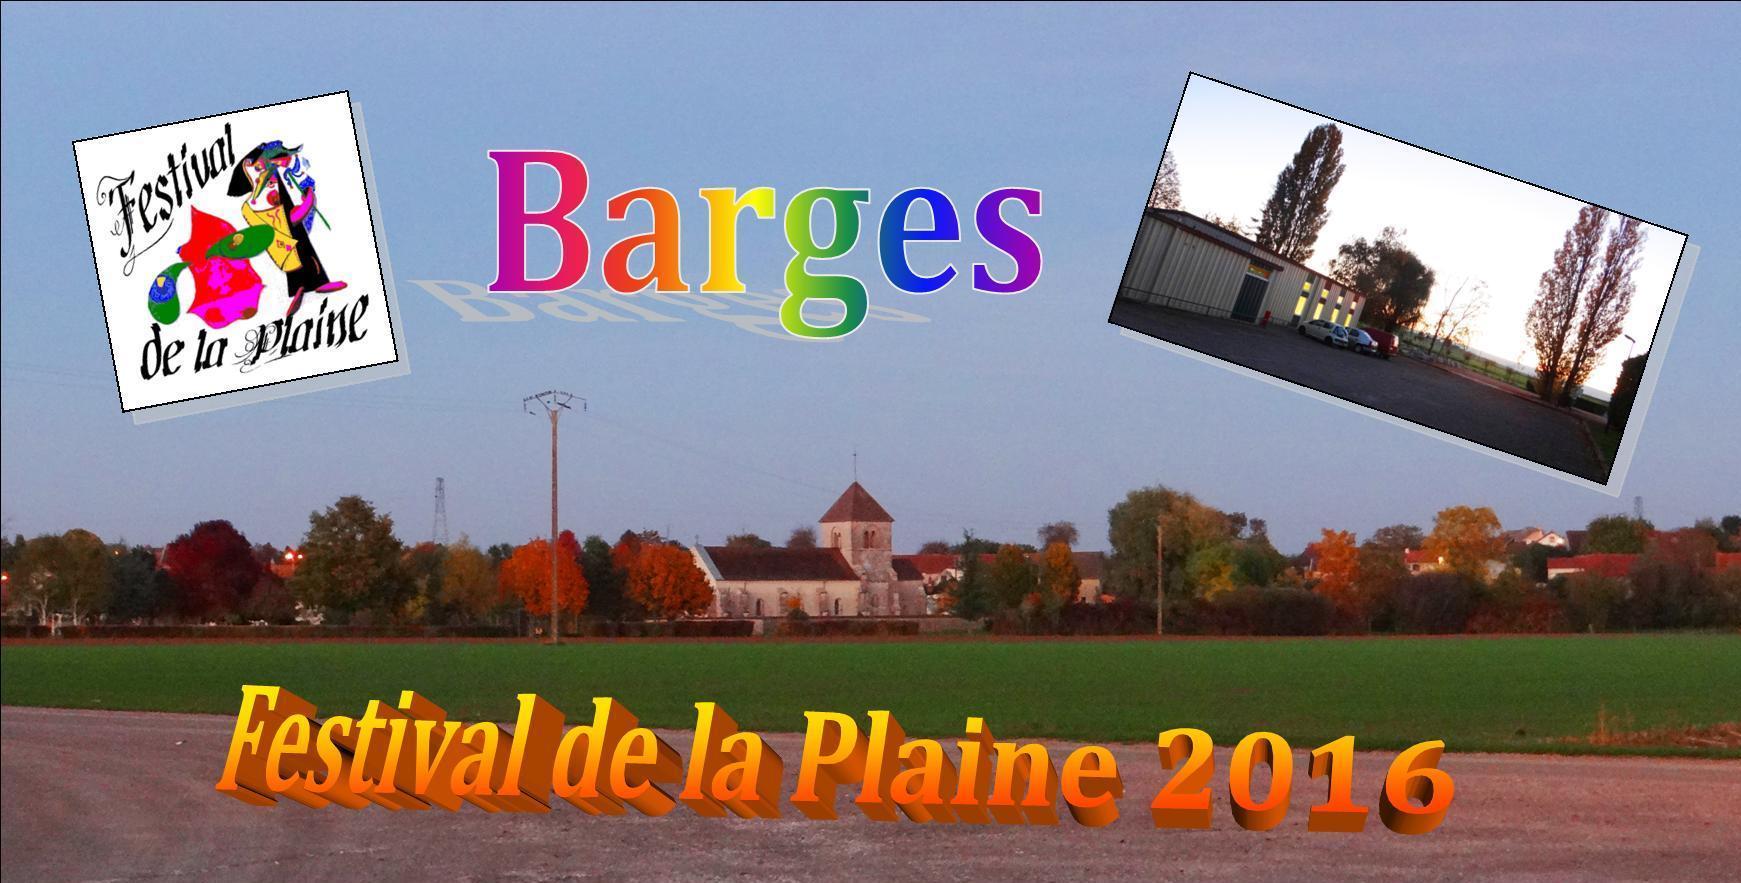 Visuel Festival de la Plaine 2016.jpg